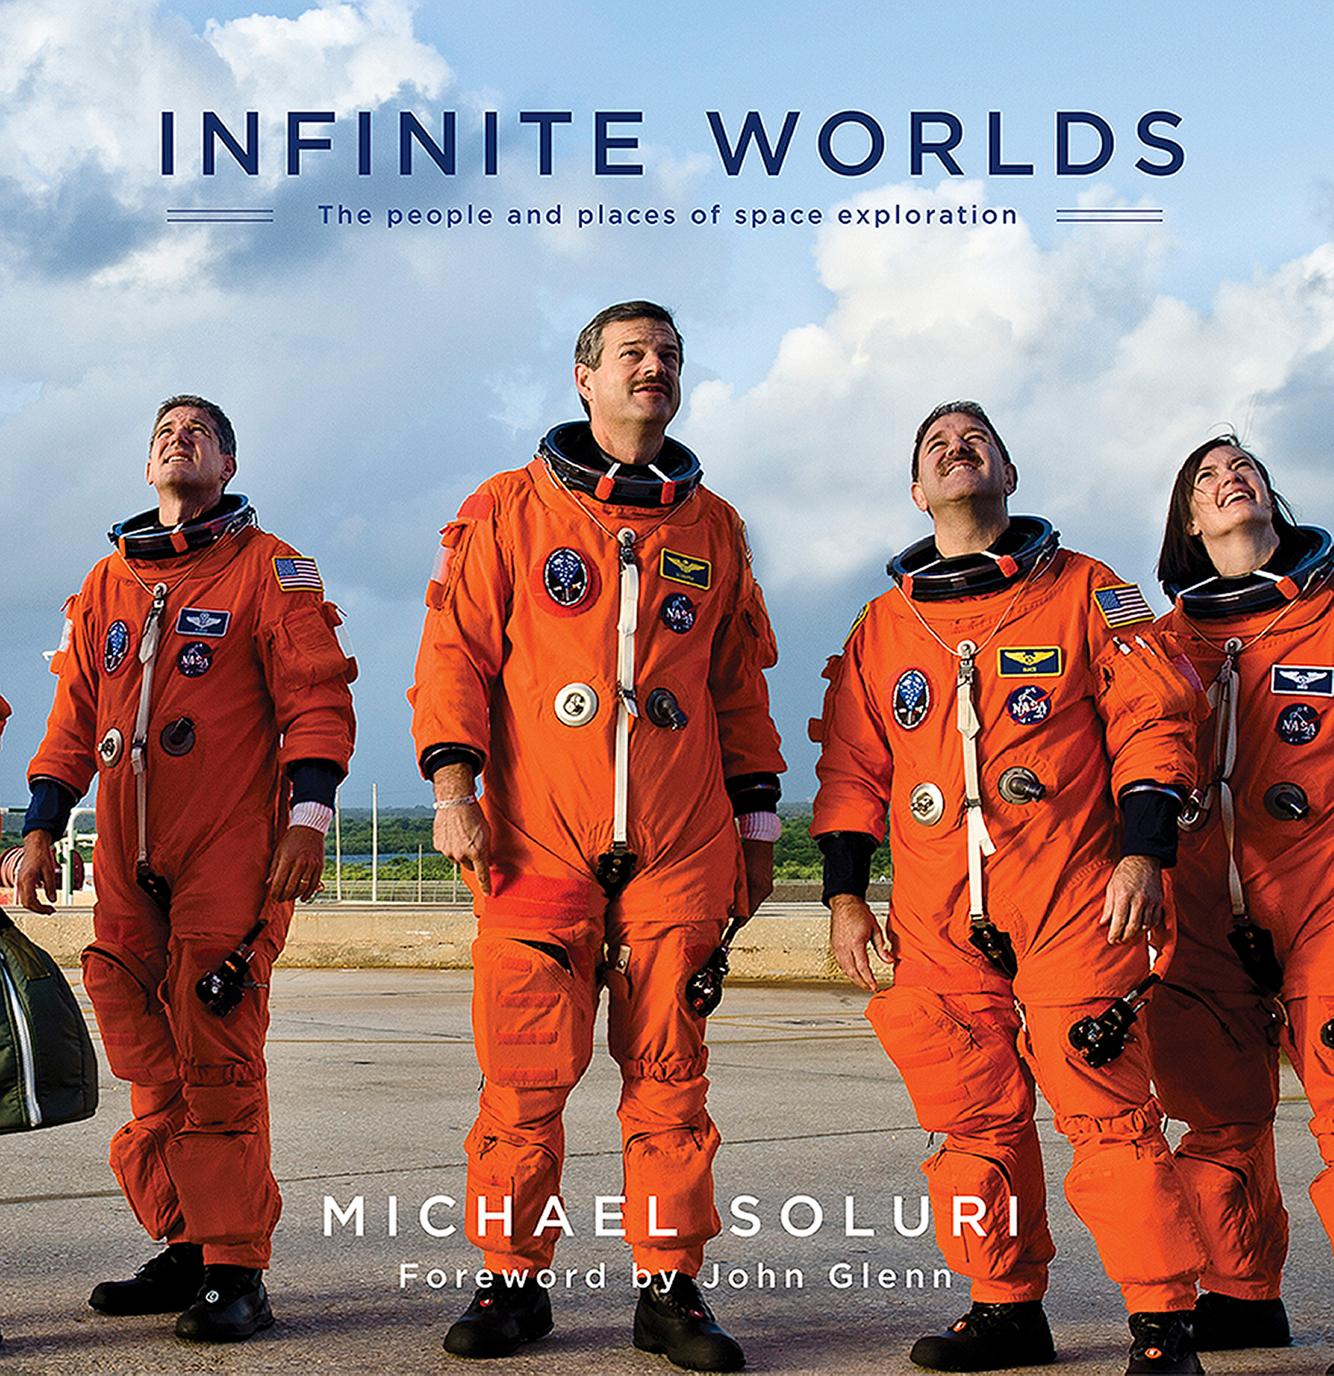 Infinite Worlds Cover©Simon&Schuster copy.jpg